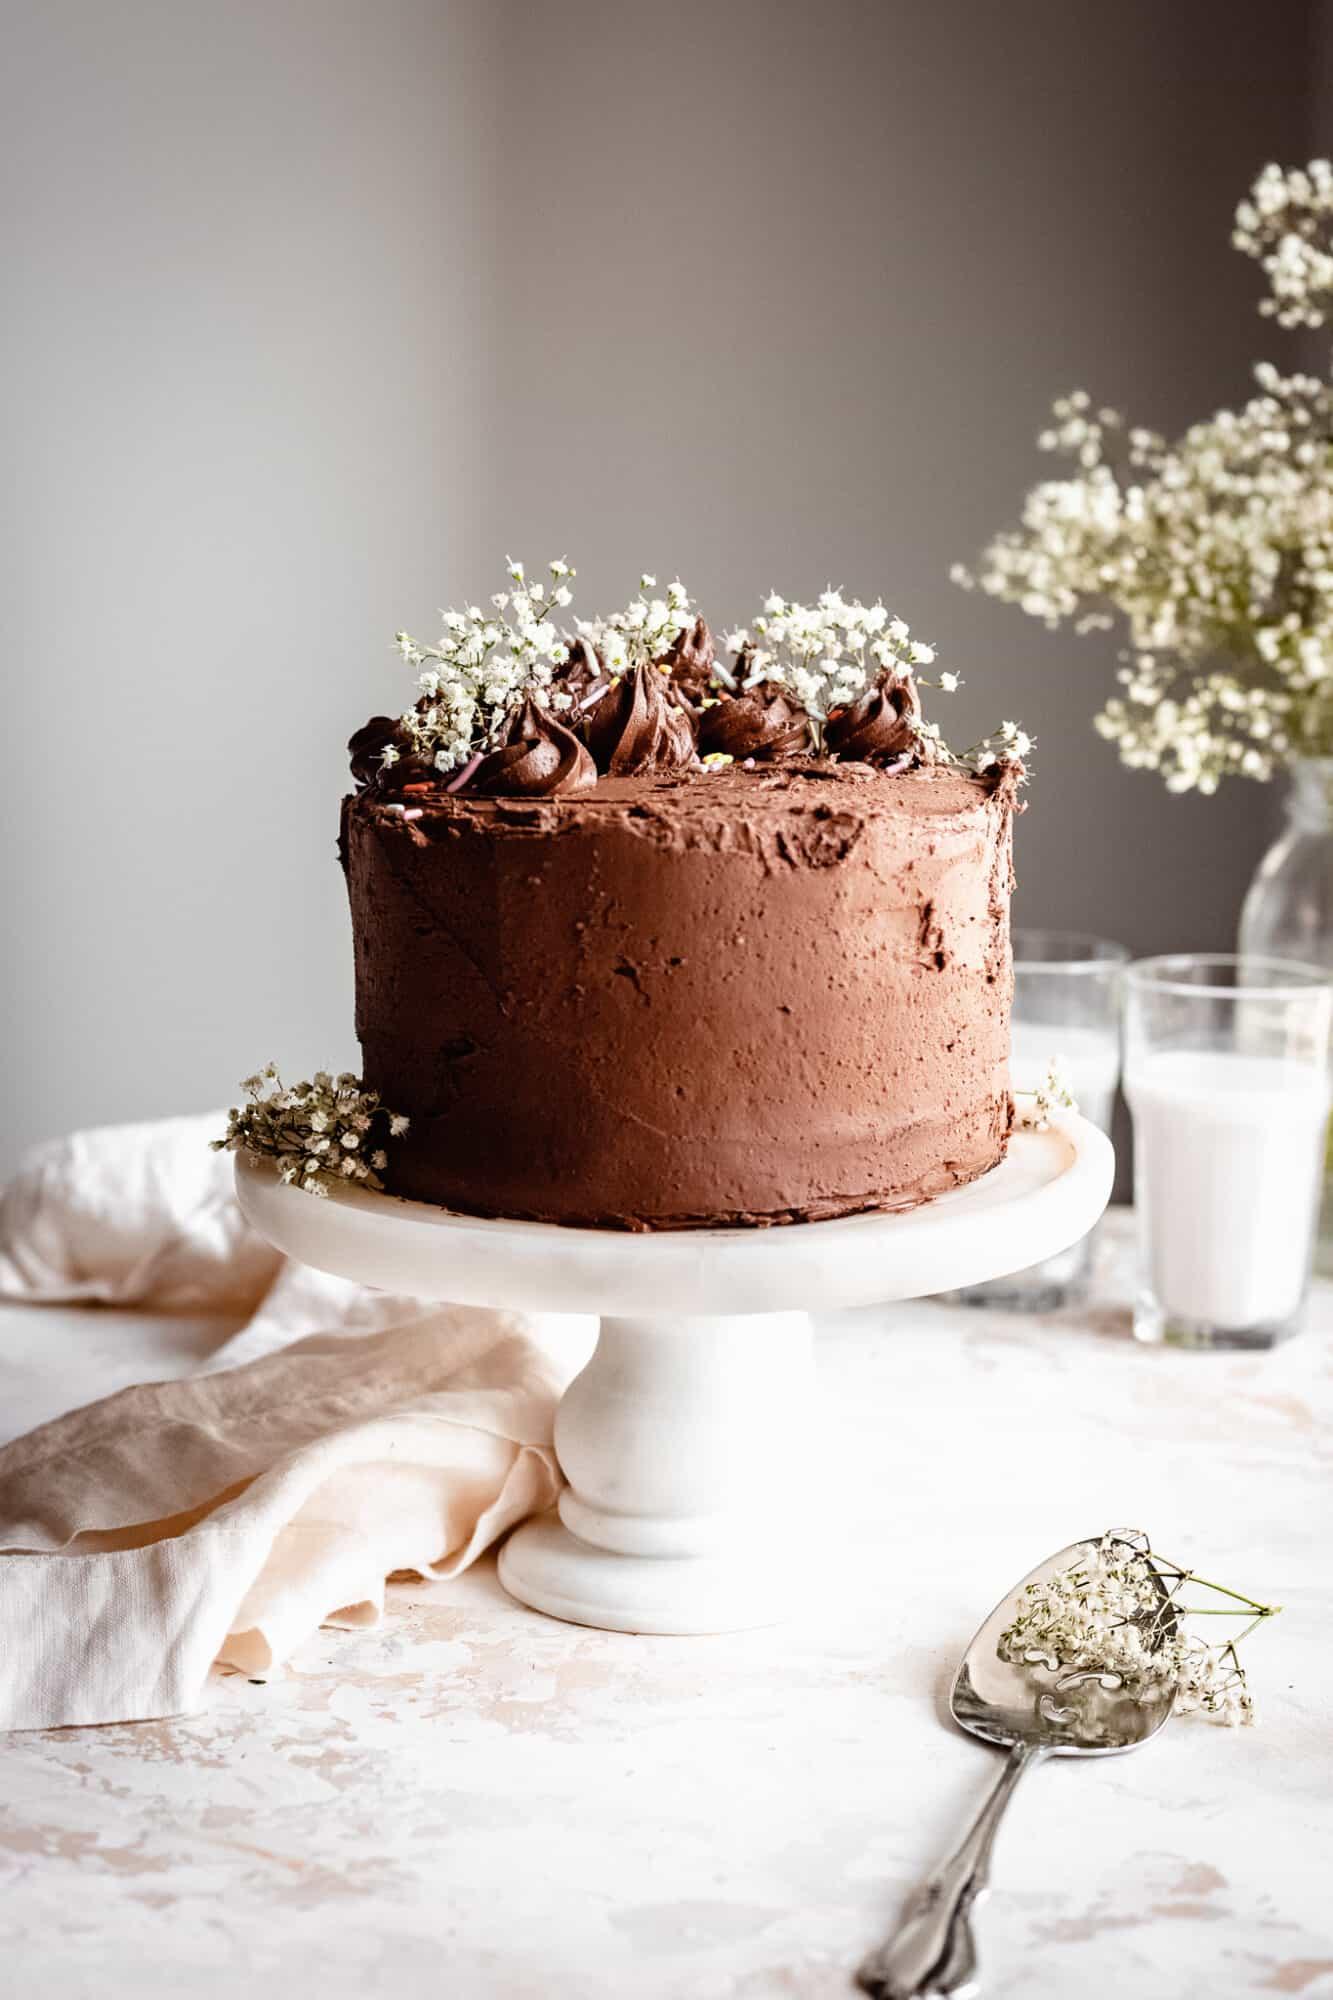 whole chocolate zucchini cake